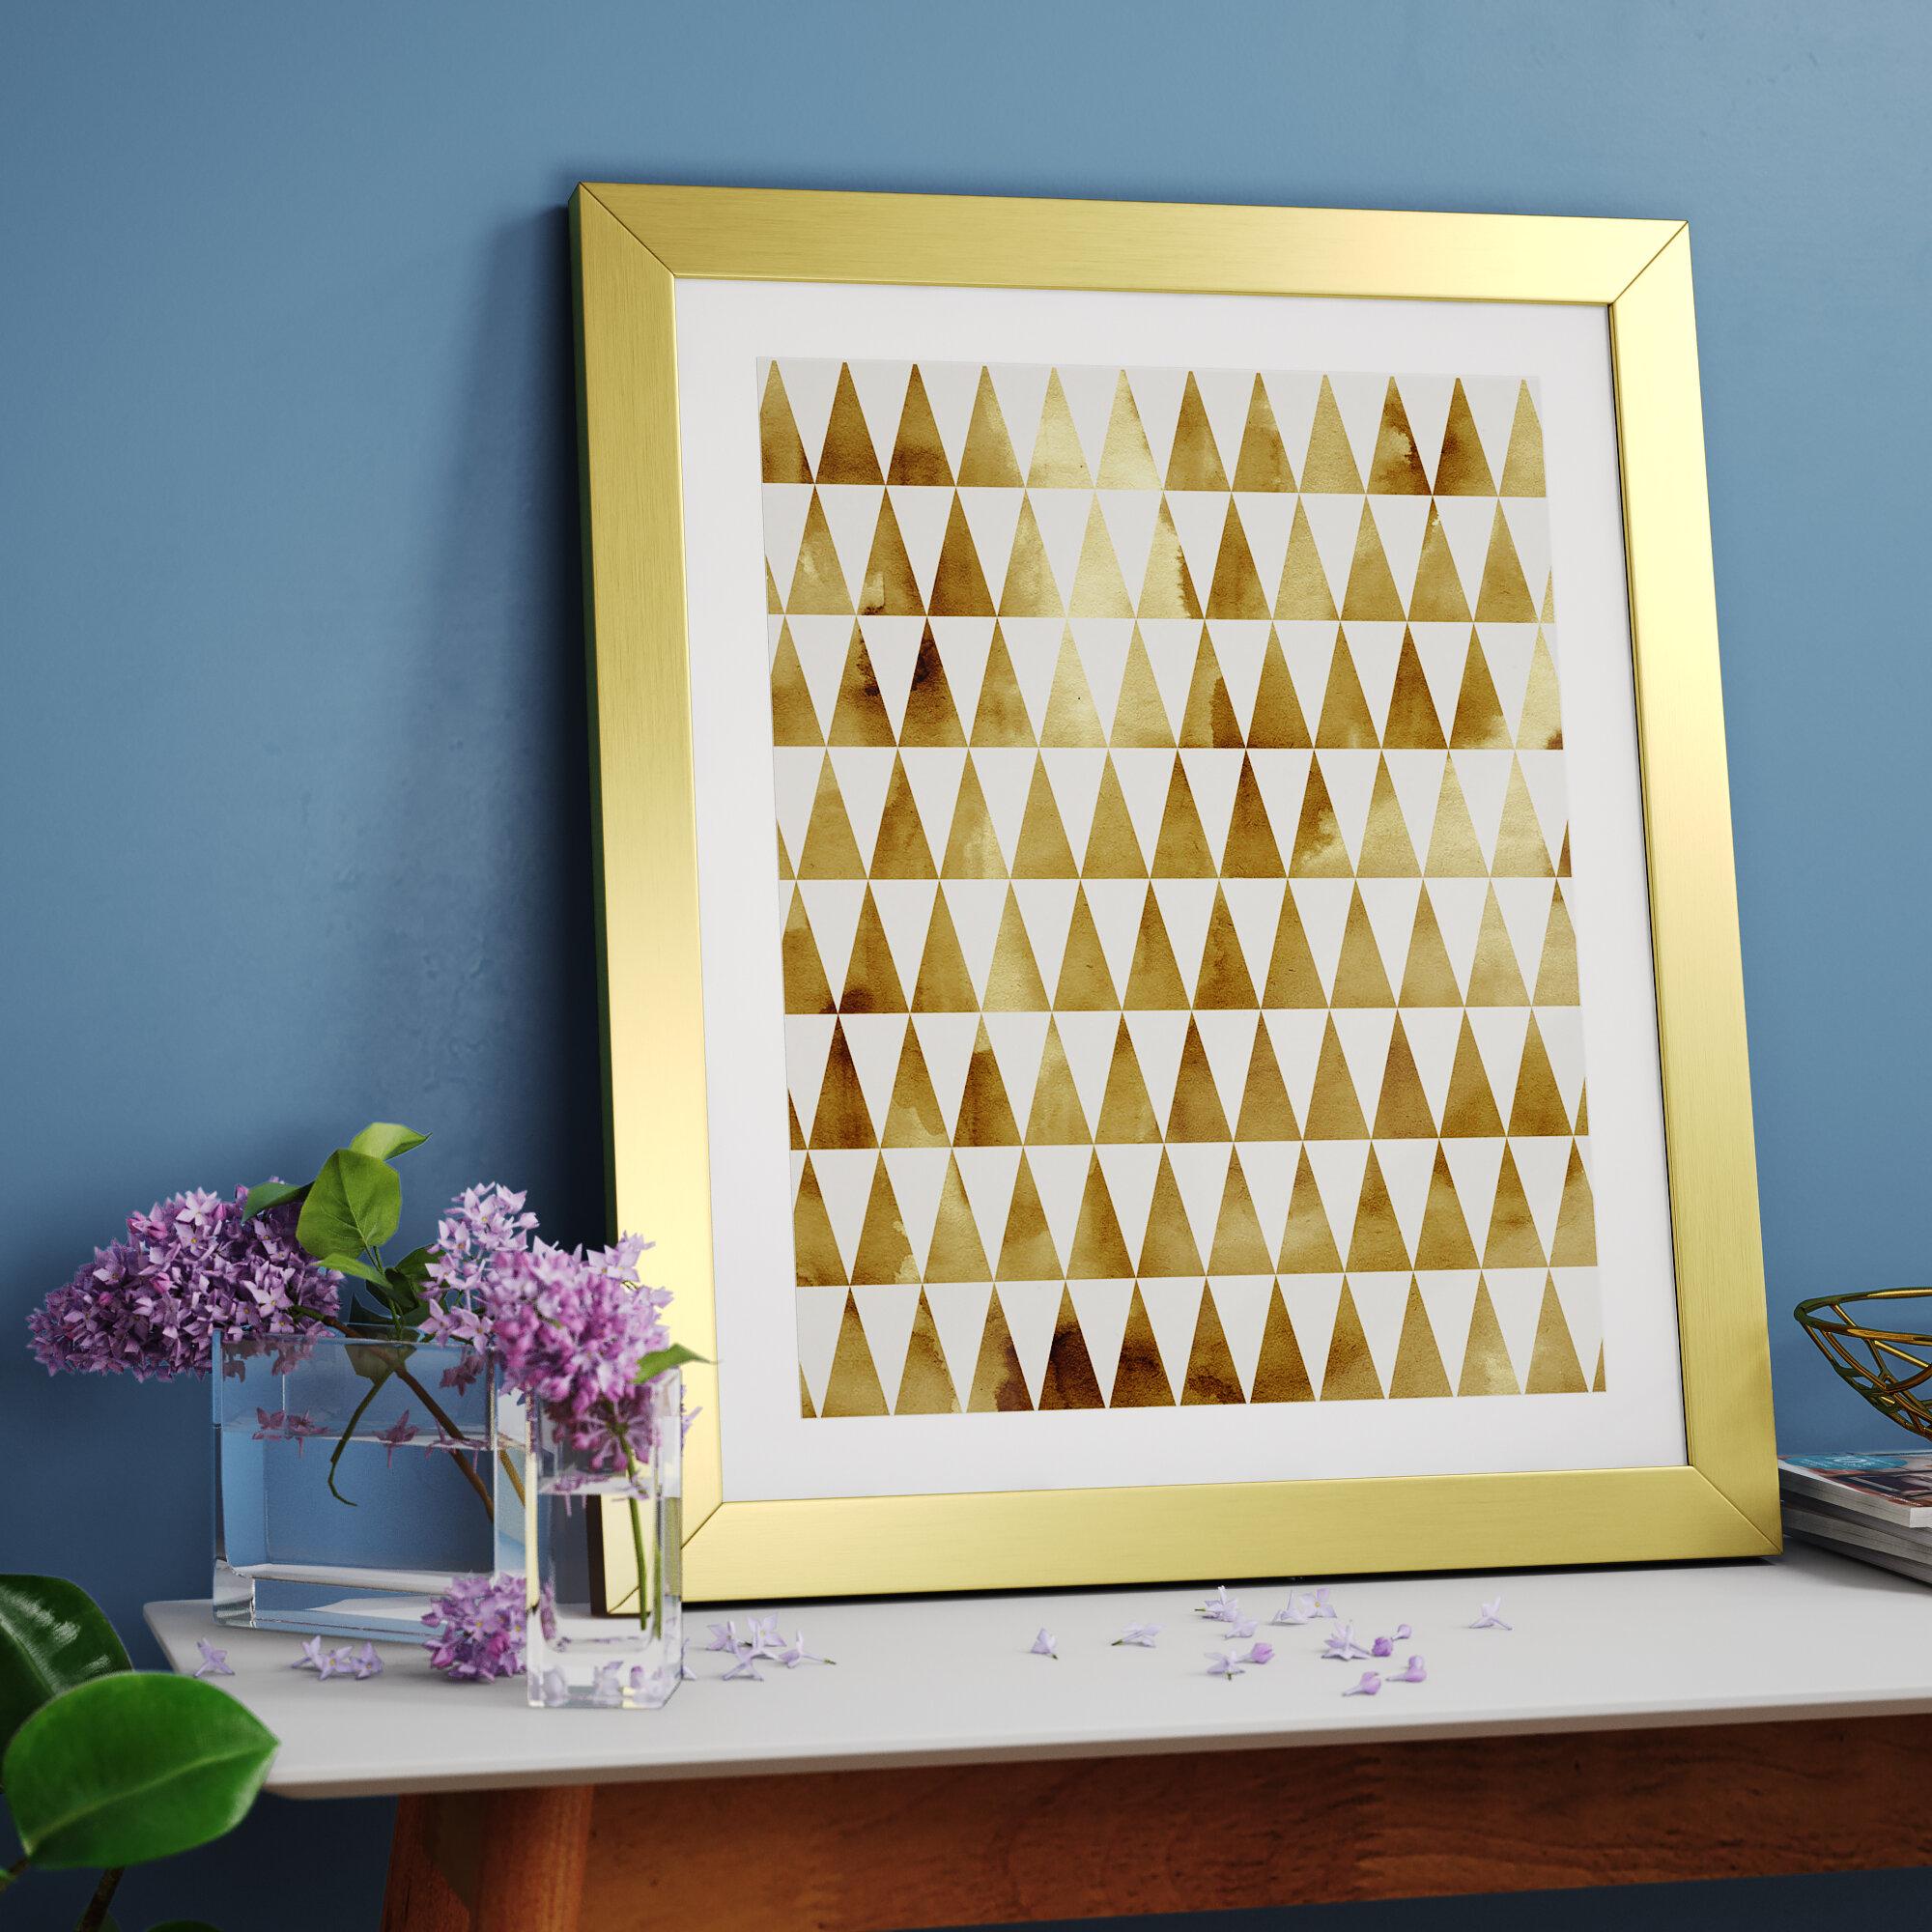 East Urban Home Triangle Pattern Gold Framed Graphic Art | Wayfair